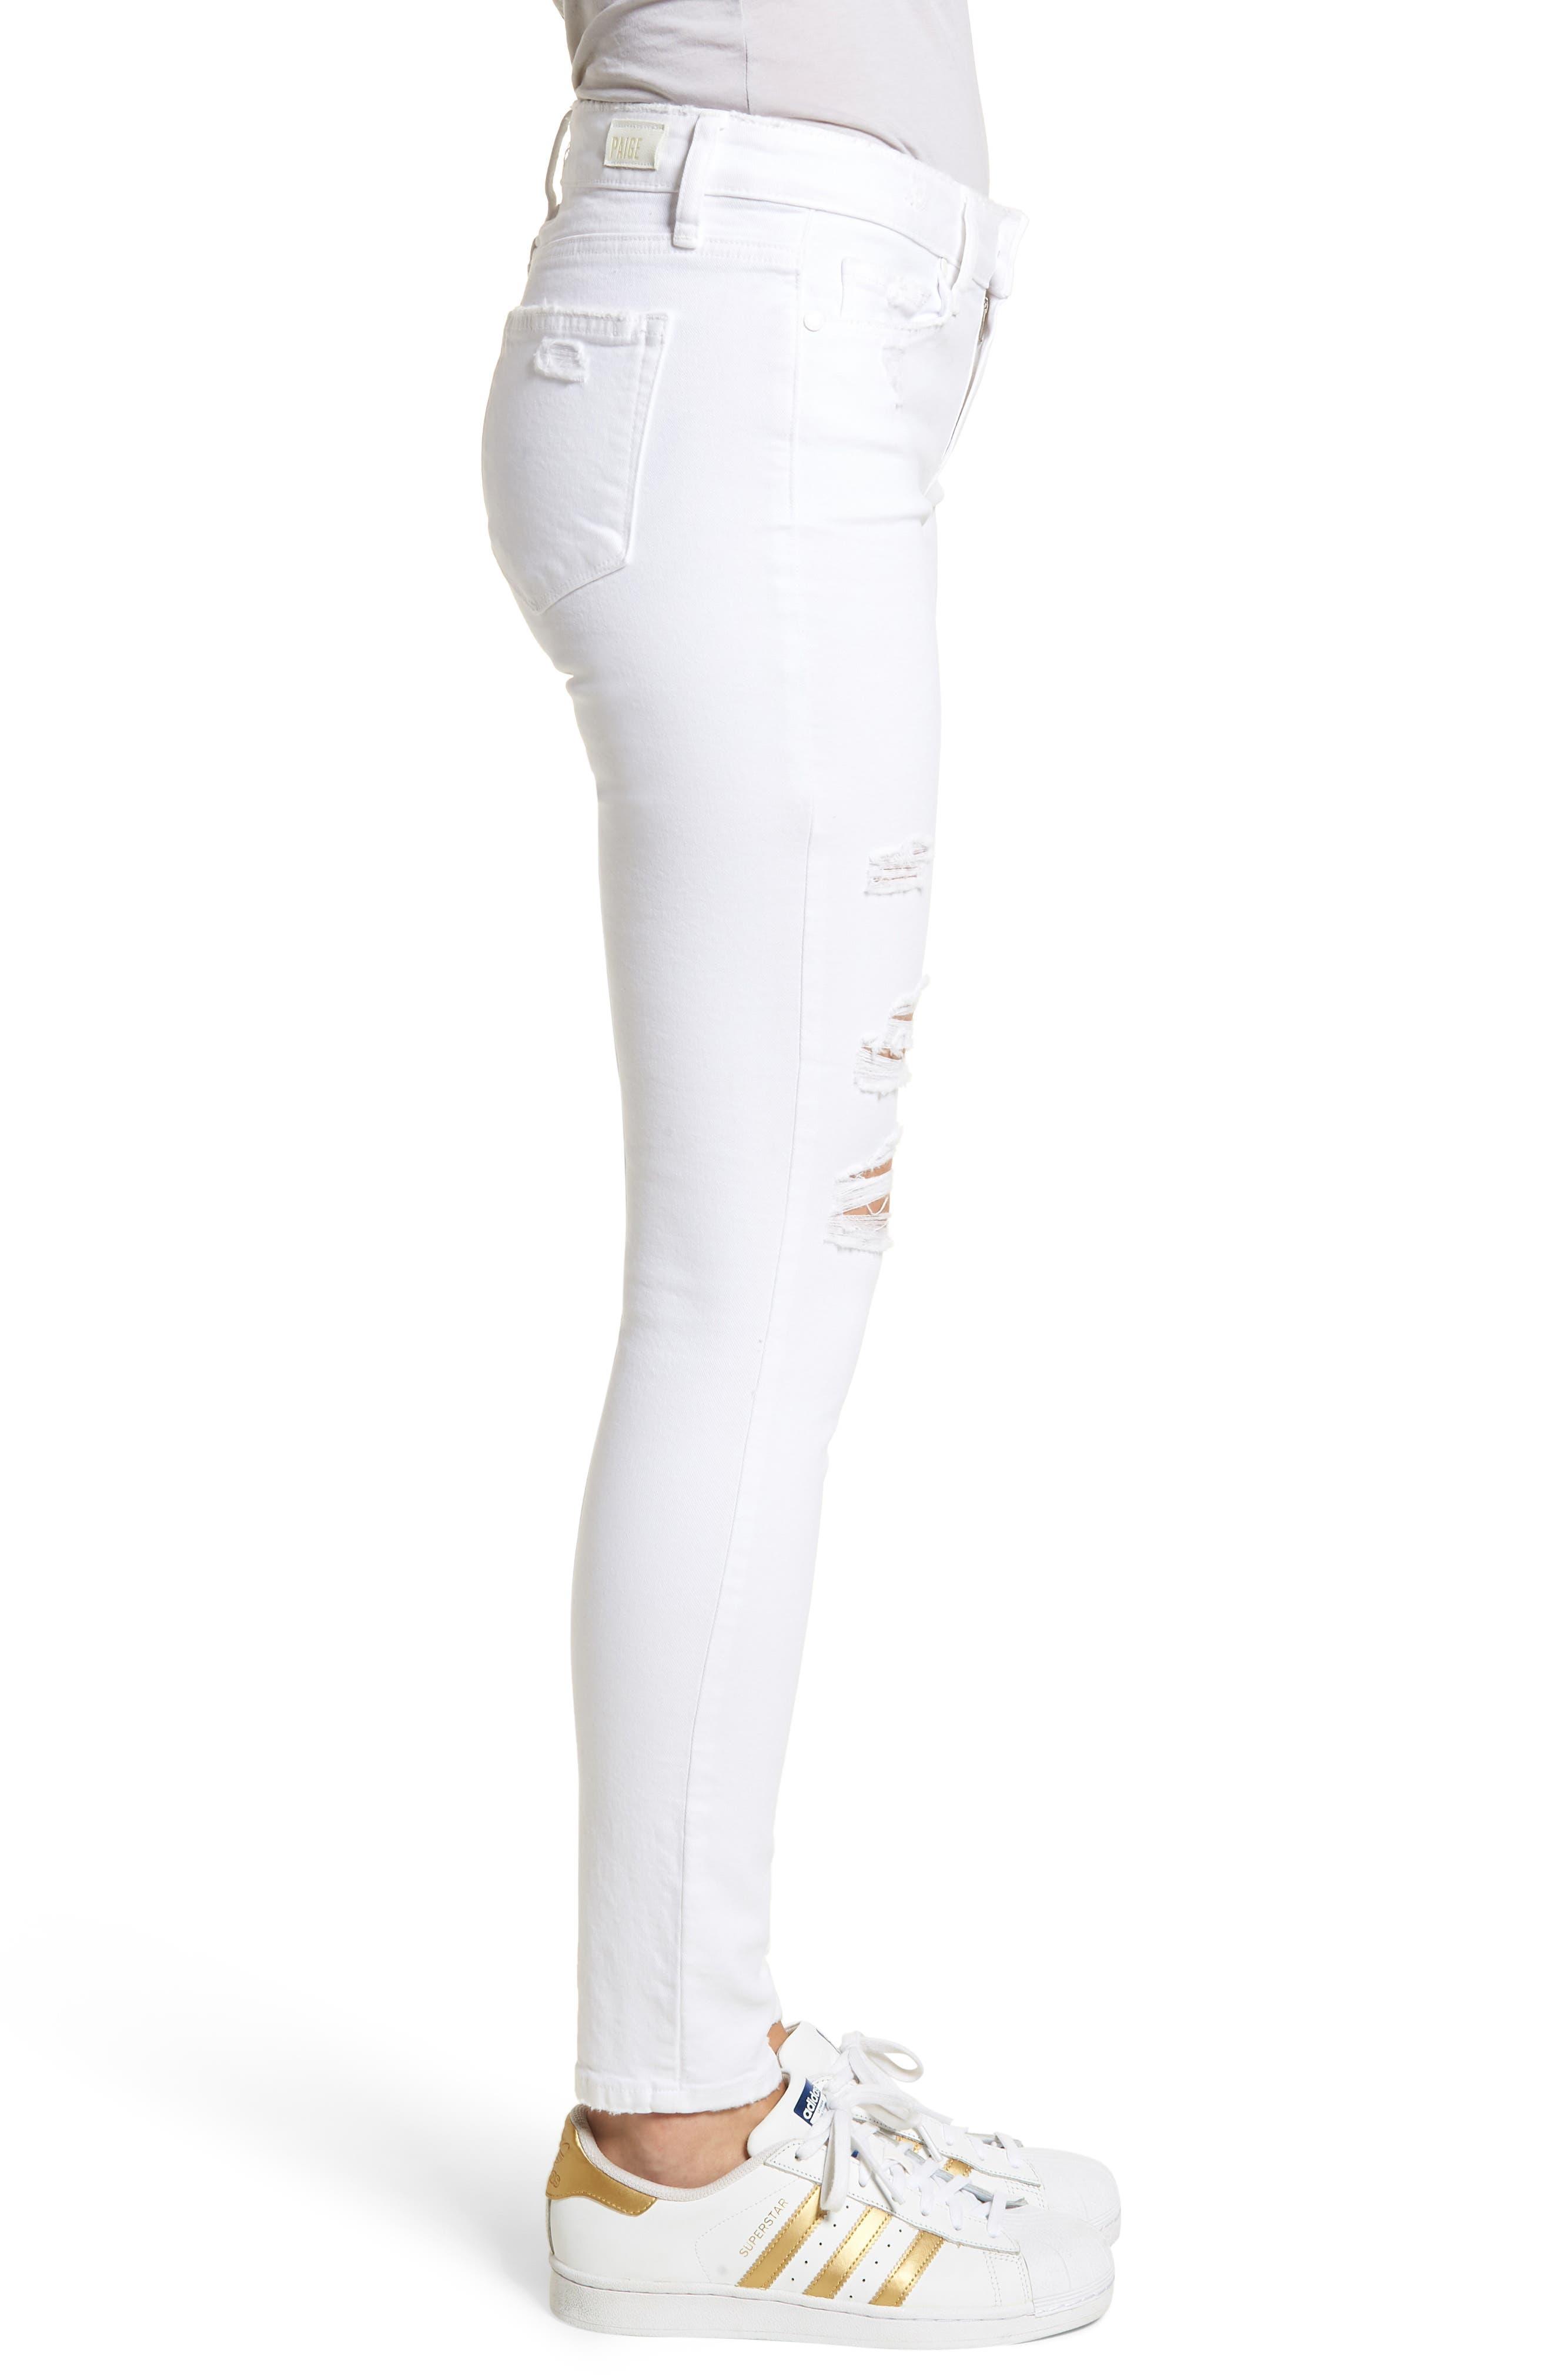 Verdugo Ripped Ultra Skinny Jeans,                             Alternate thumbnail 3, color,                             100